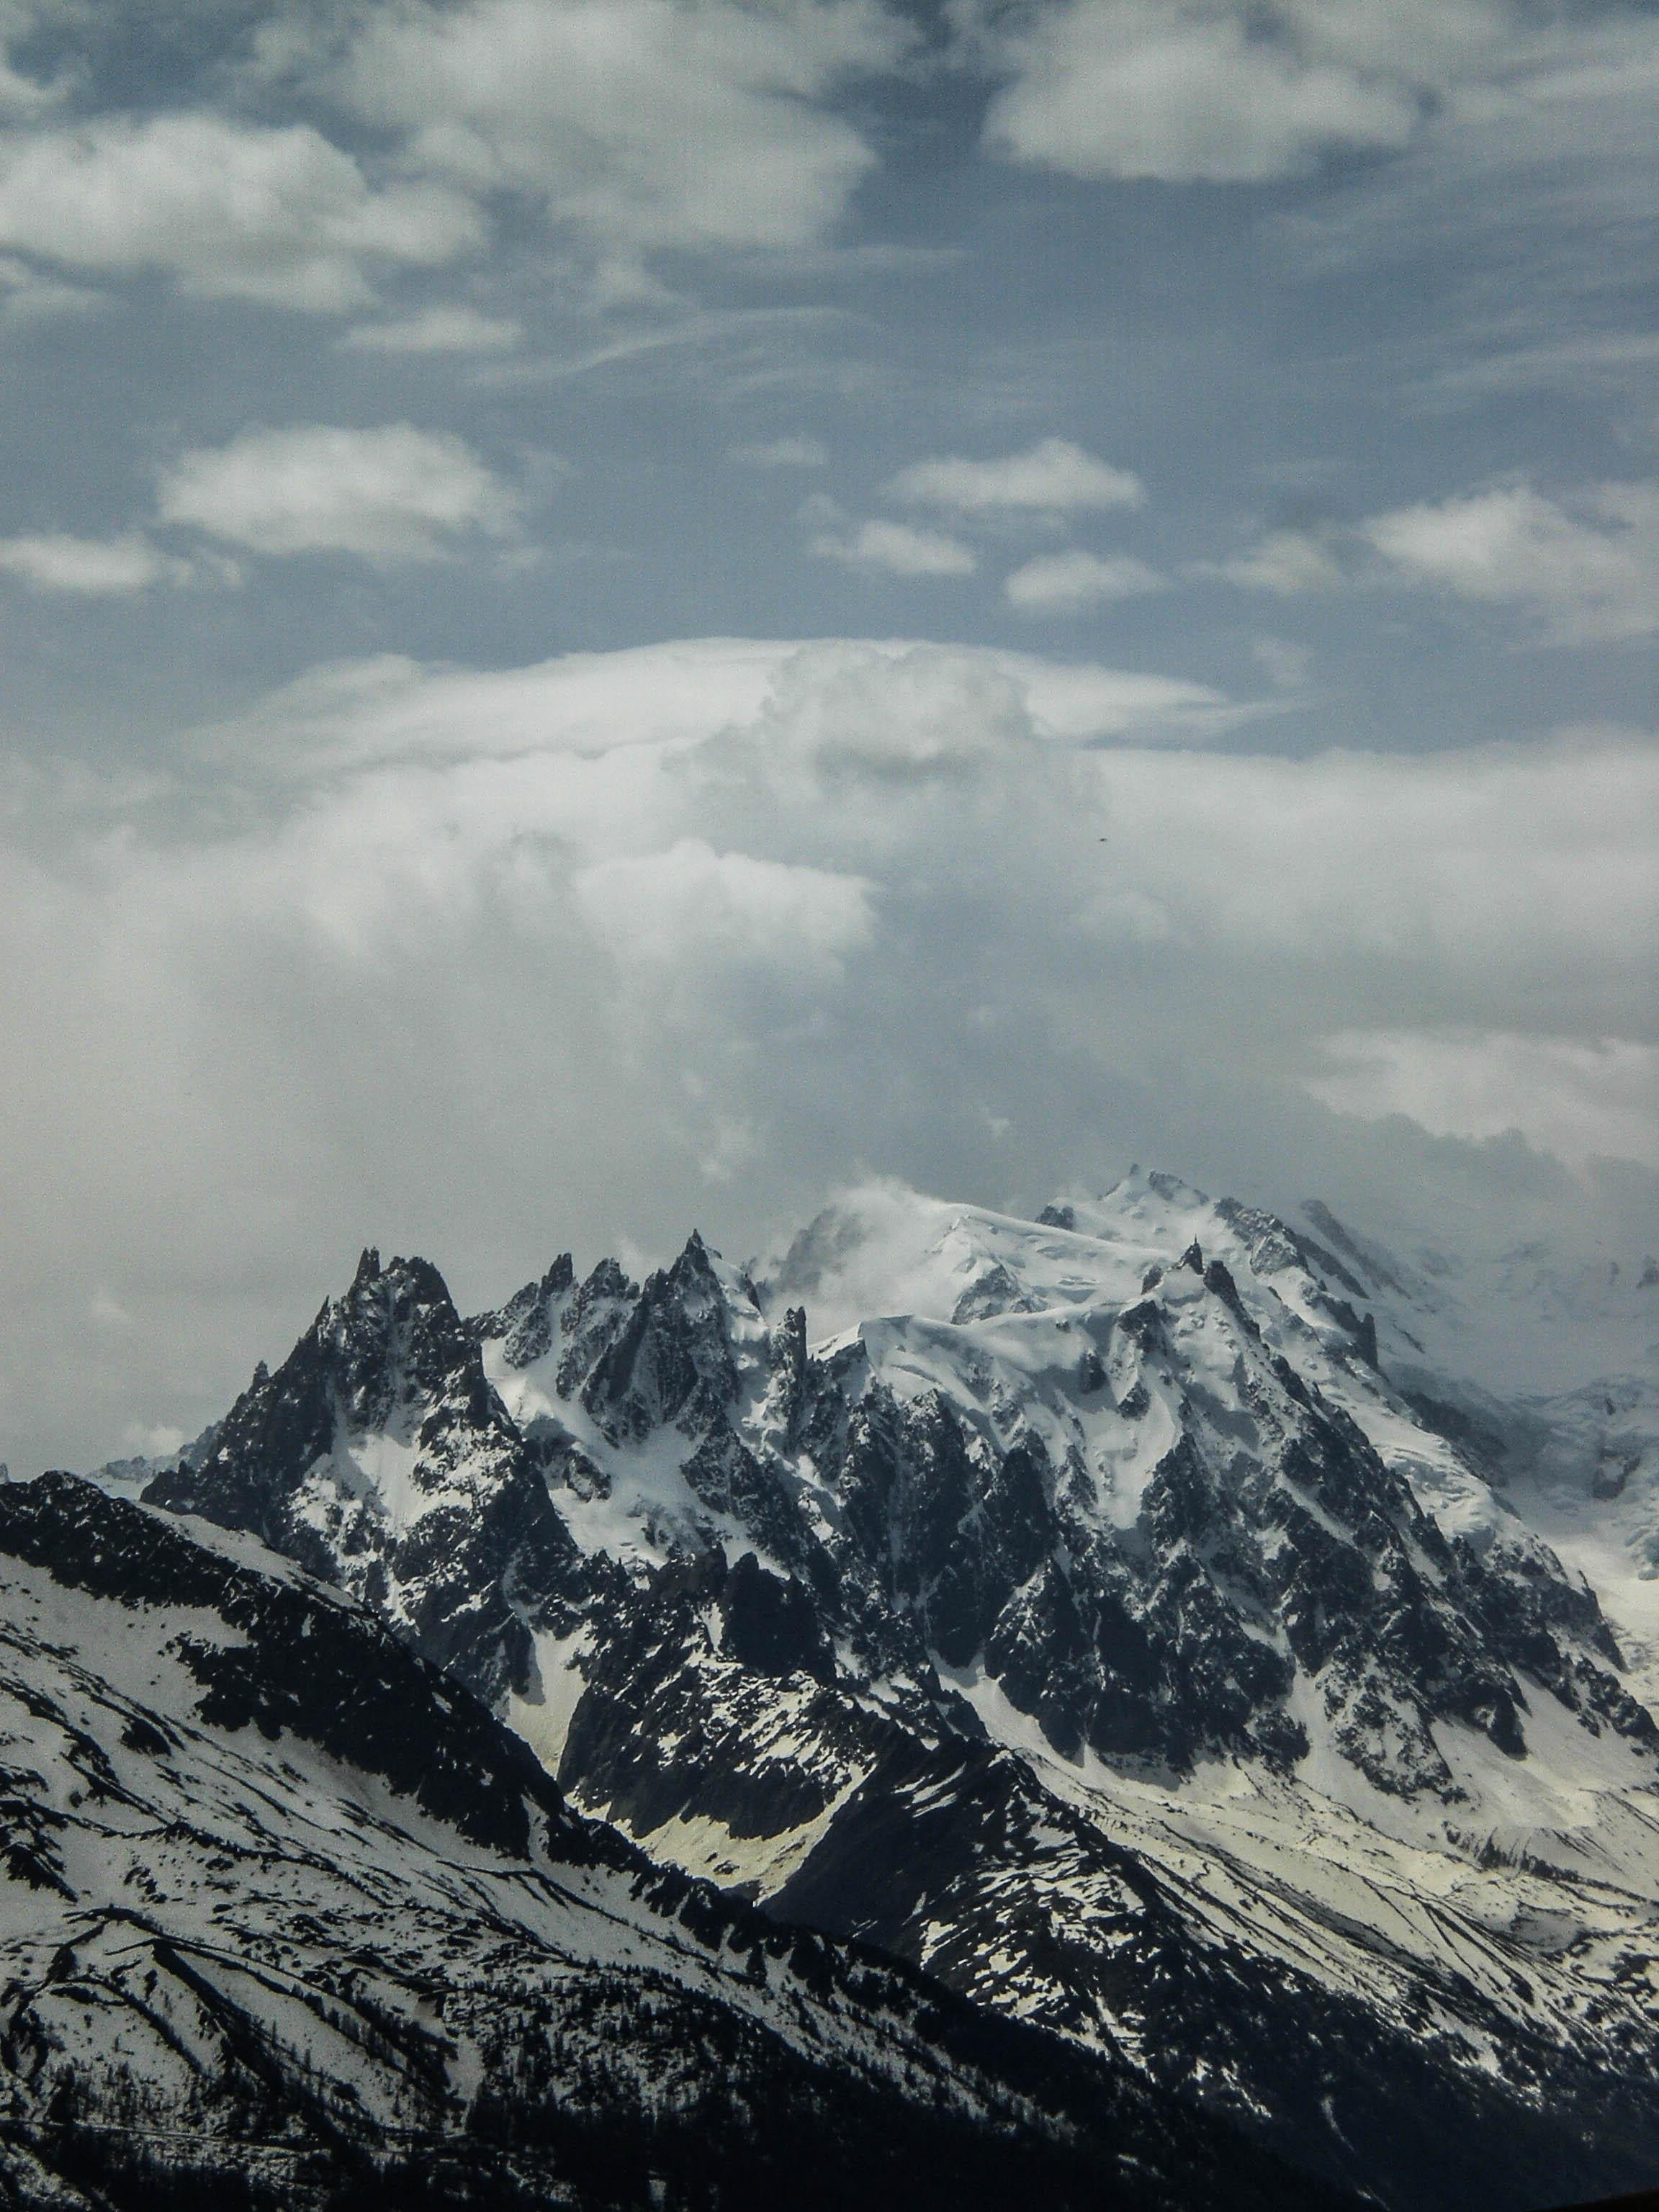 Die Aiguilles und Mont Blanc du Tacul